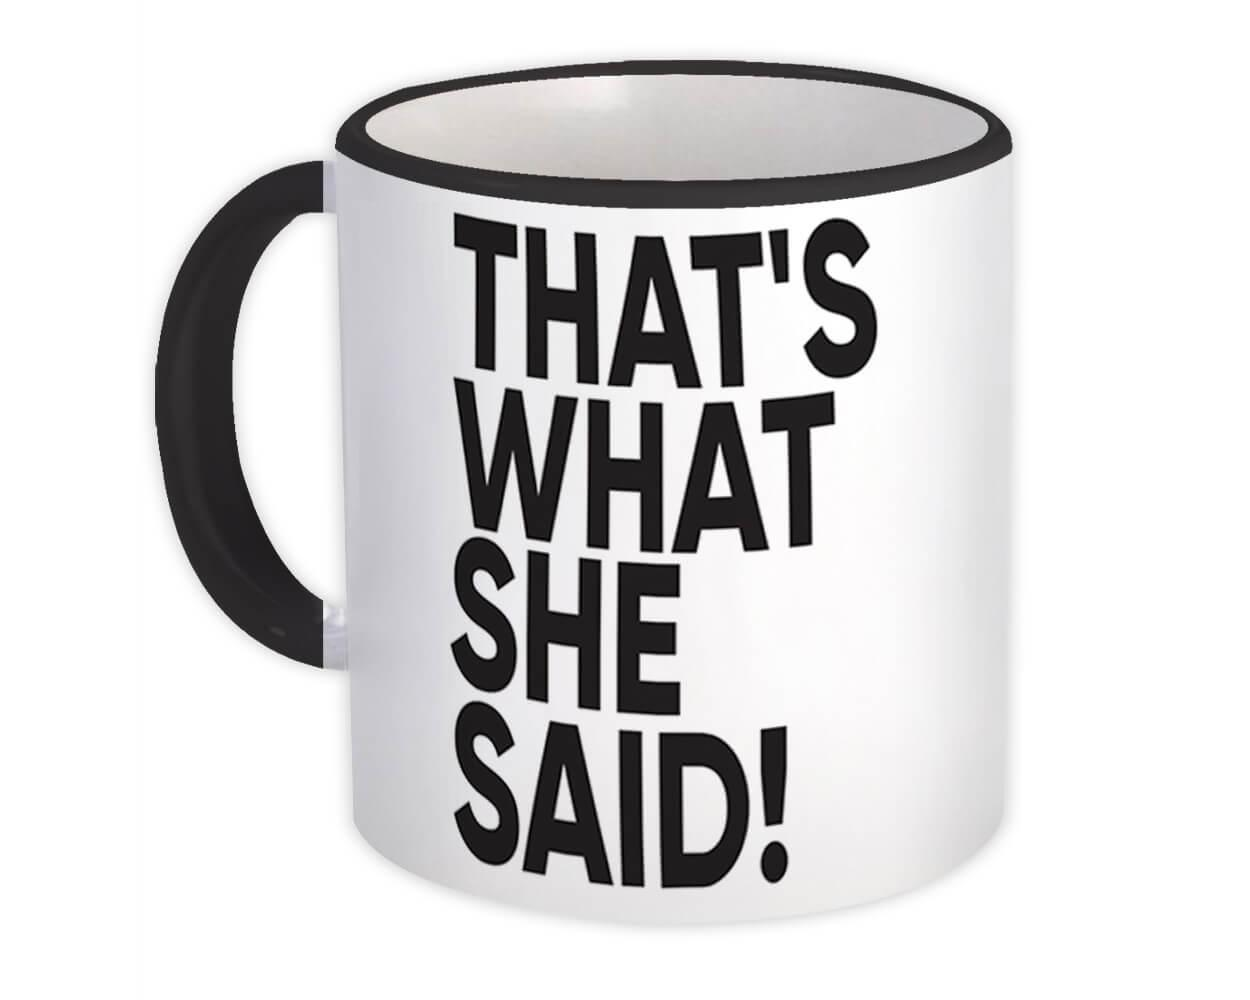 Thats What She Said : Gift Mug Funny Novelty Parody